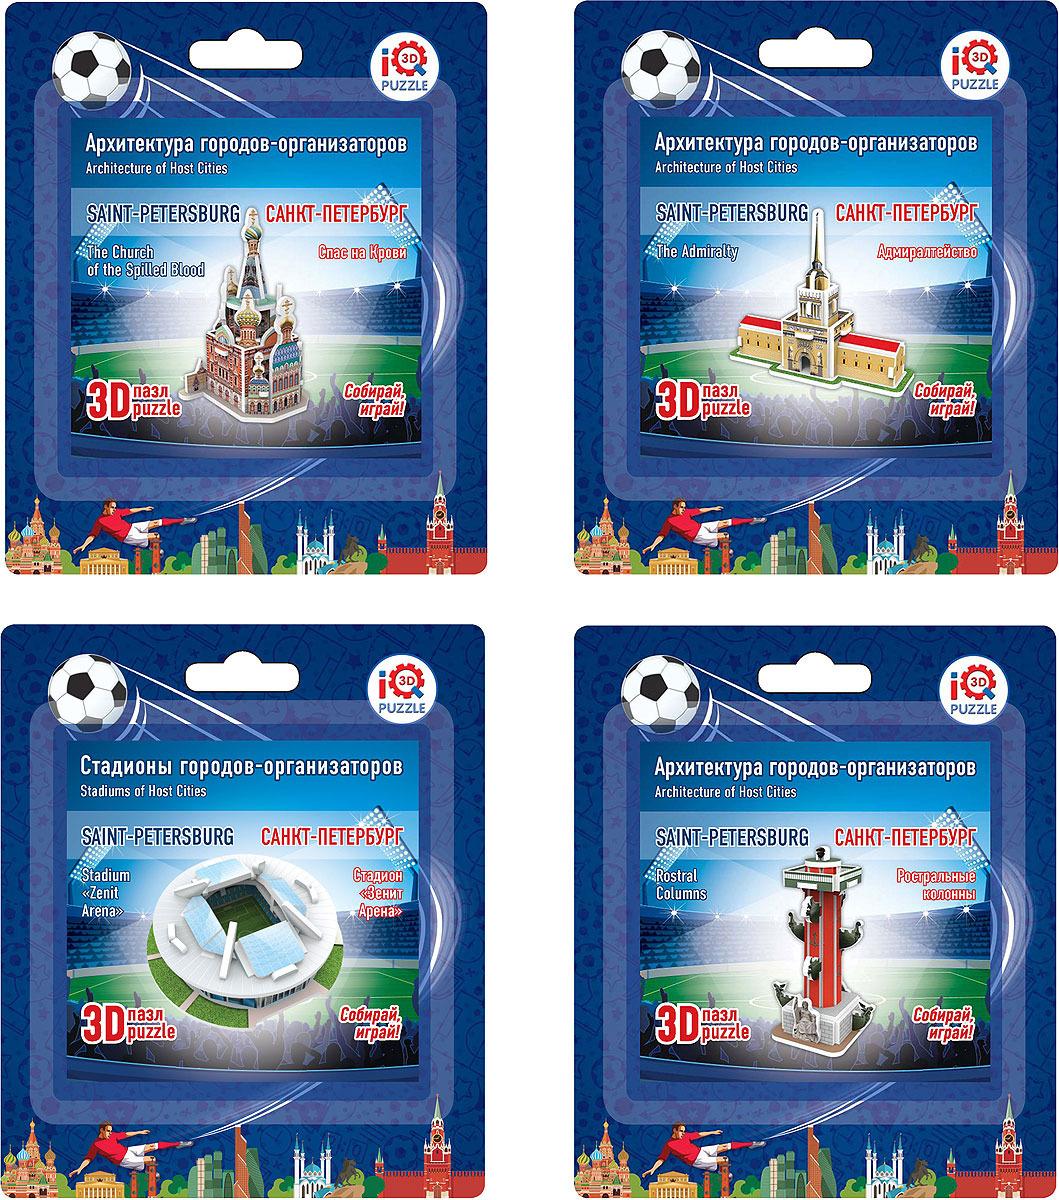 Набор 3D Пазлов IQ 3D Puzzle Санкт-Петербург, архитектура + стадион, 4 шт iq 3d puzzle 3d пазл сиднейский оперный театр